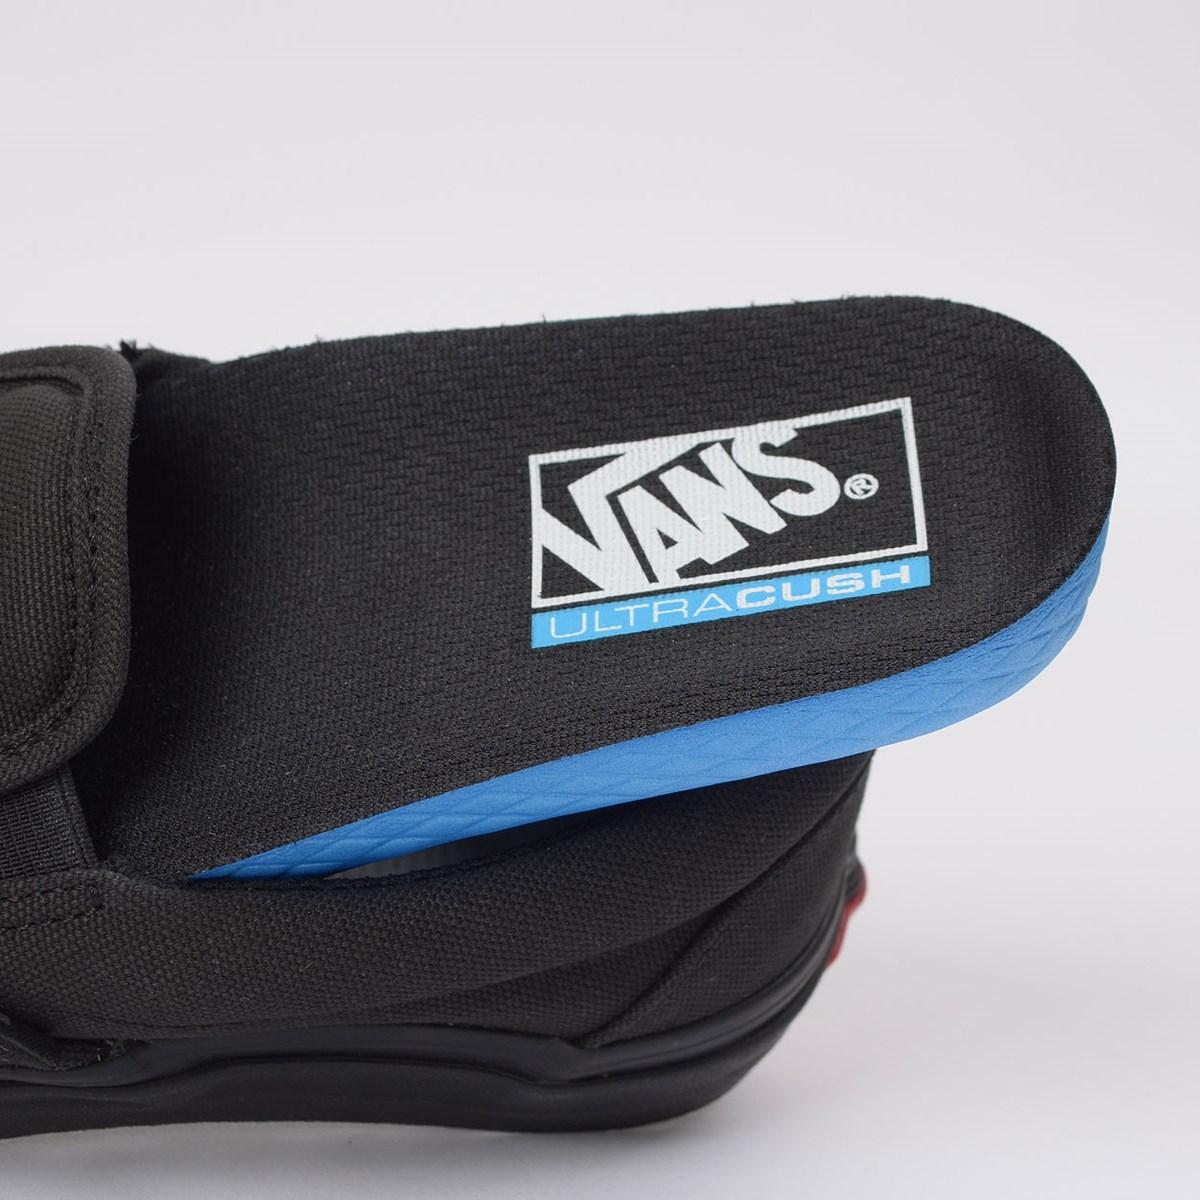 Tênis Vans Classic Slip On UC Made For The Makers Black Black VN0A3MUDV7W